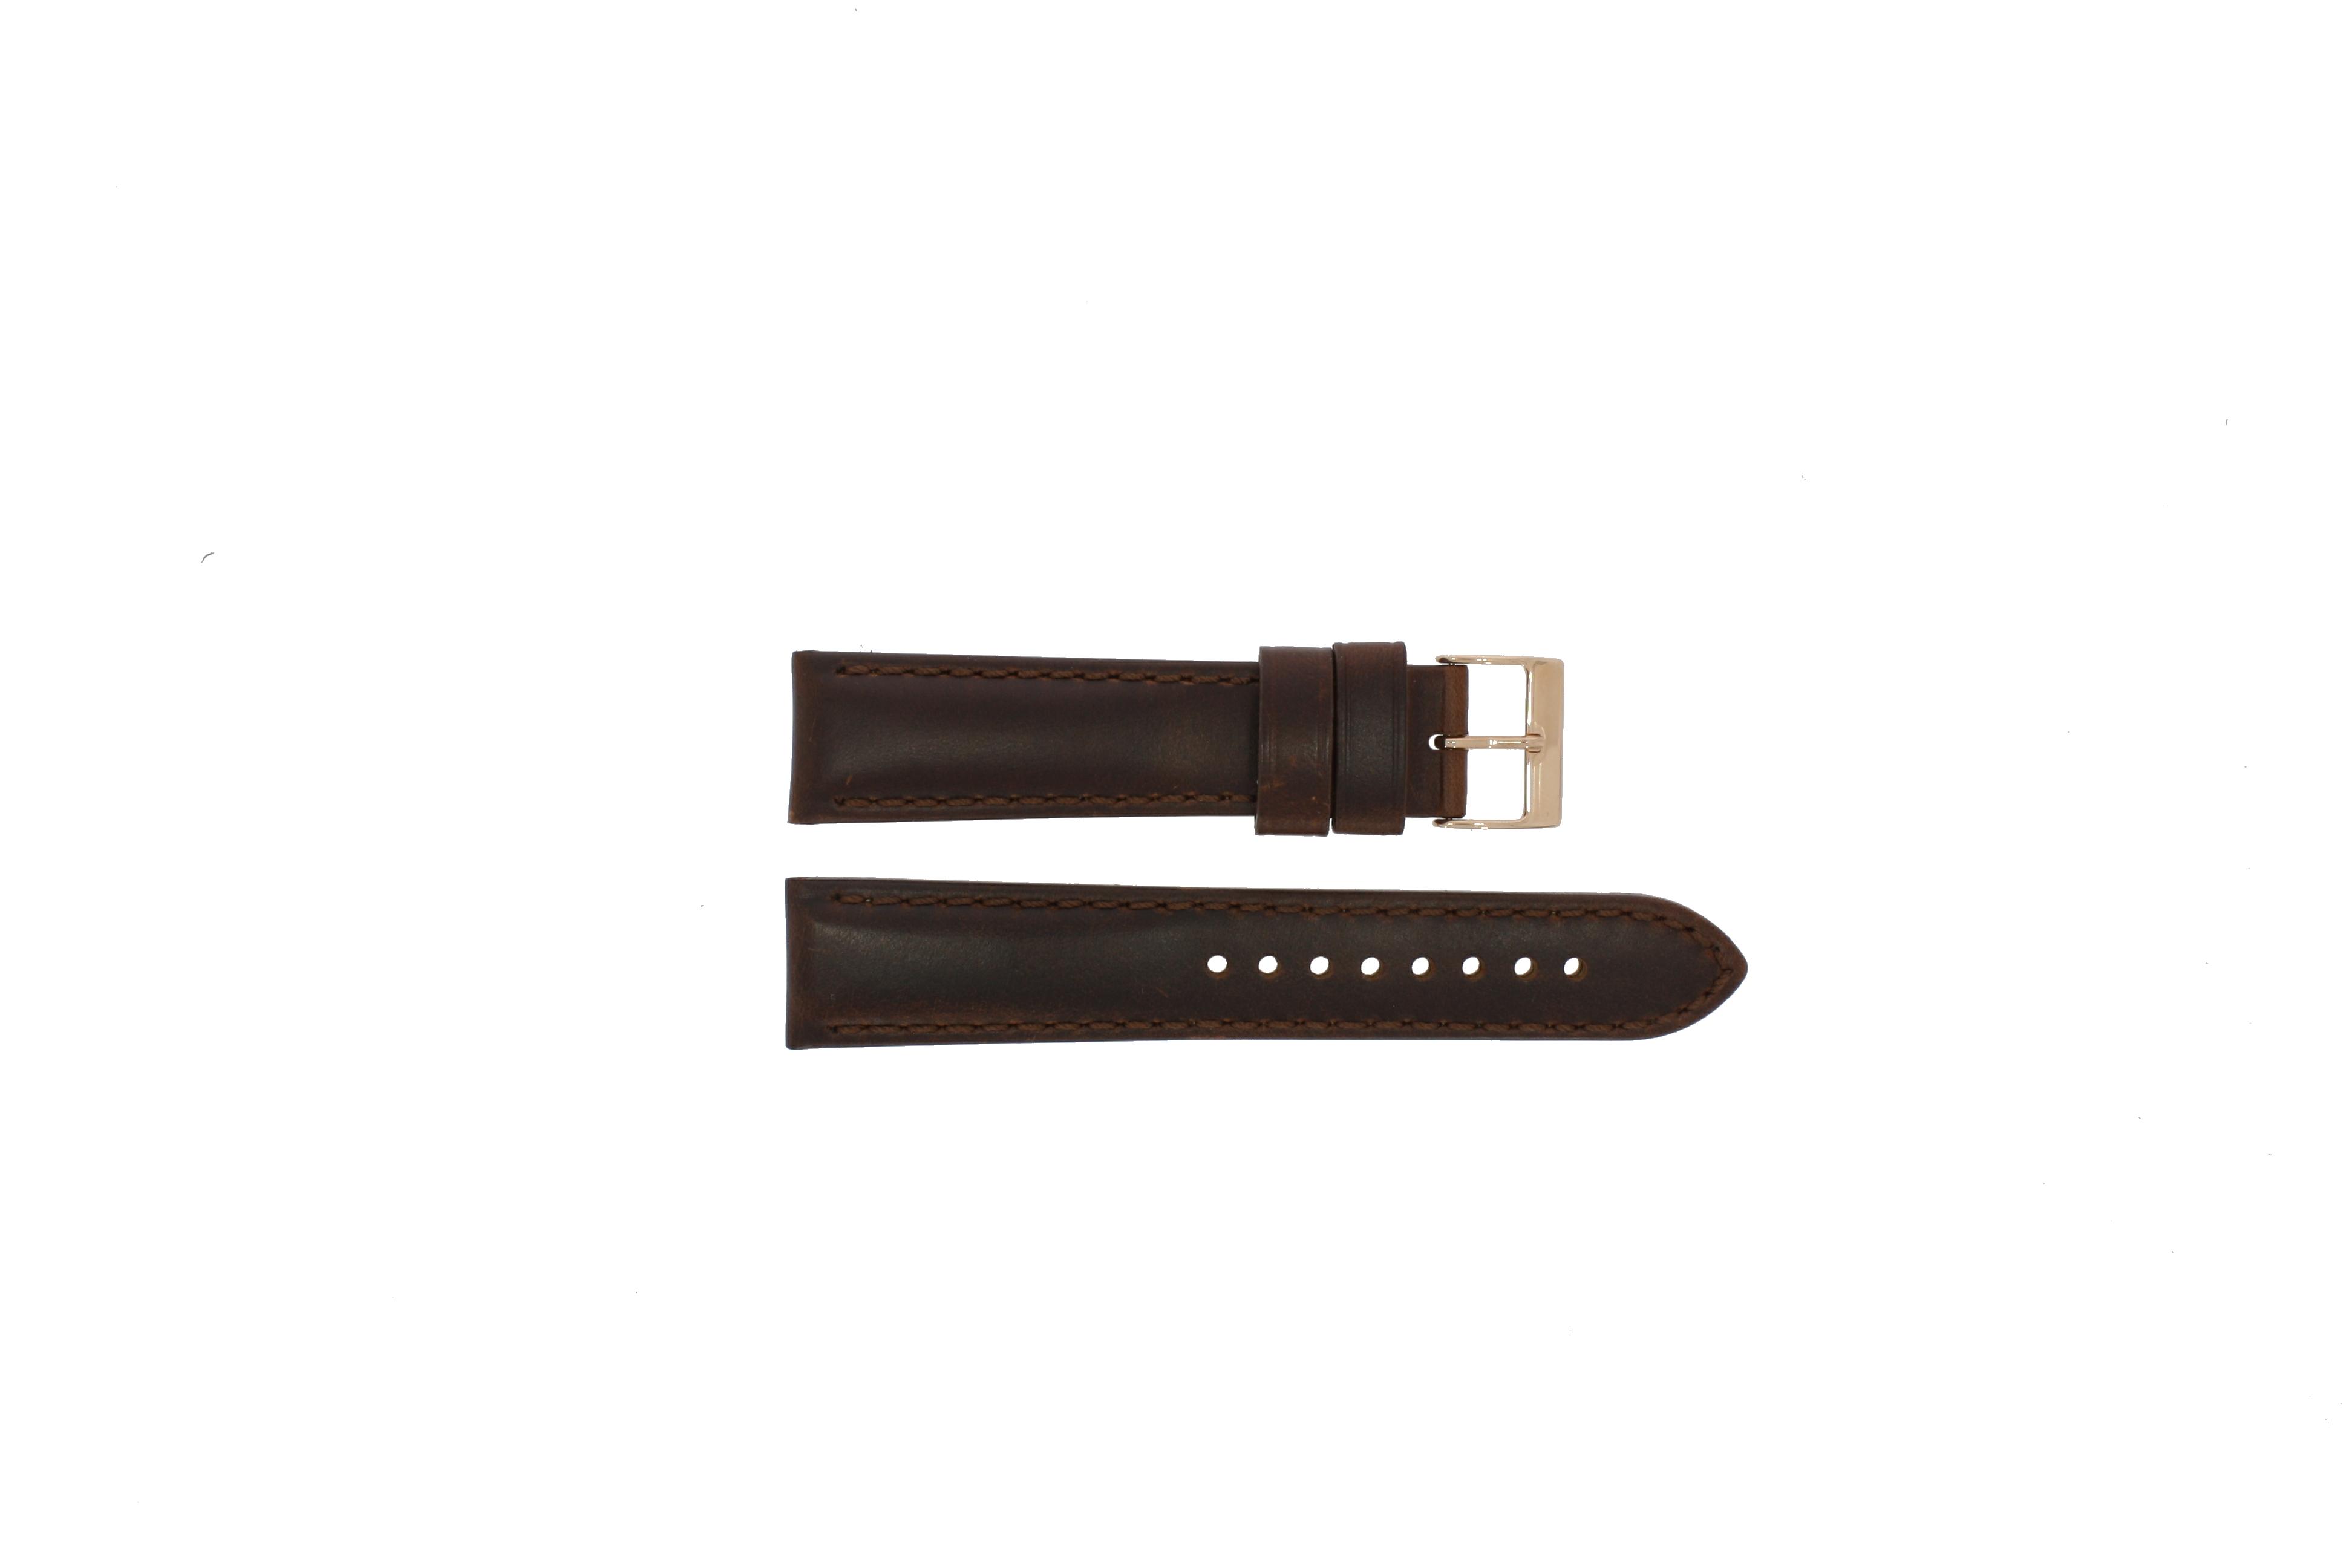 Daniel Wellington (replacement model) klockarmband 0106DW Läder Brun 20mm + sömmar brun